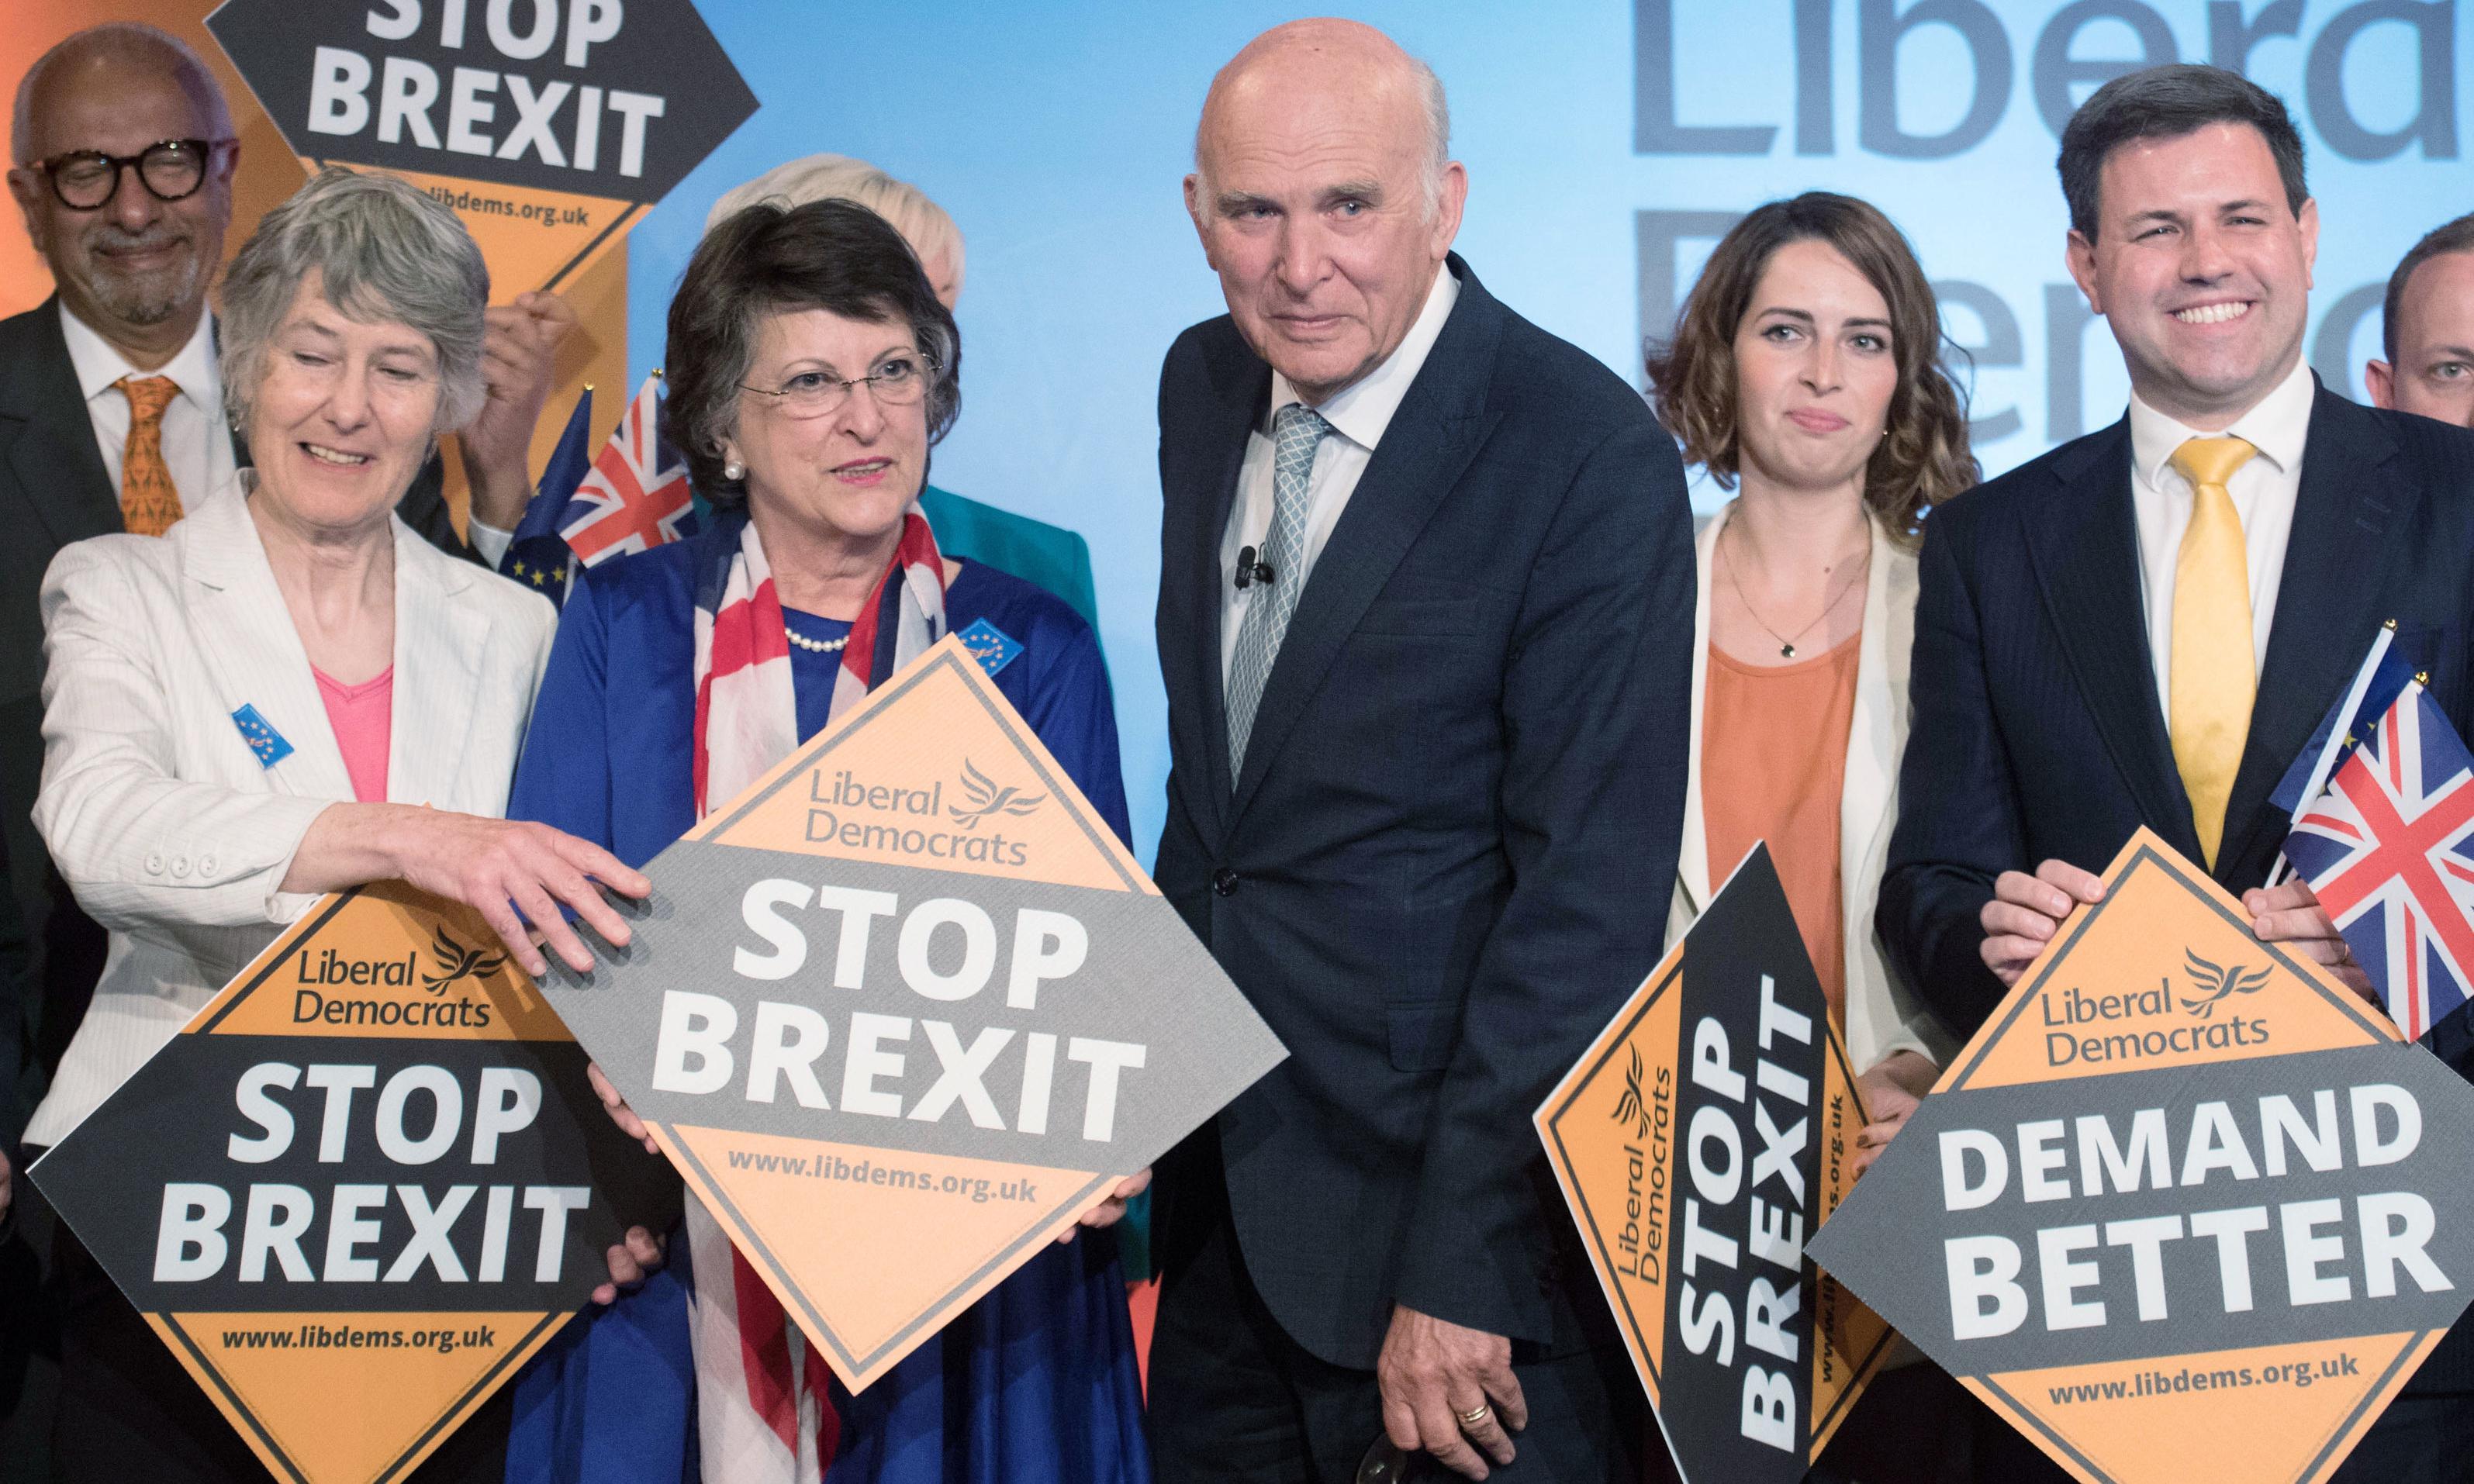 Lib Dems launch EU election campaign with 'Stop Brexit' message